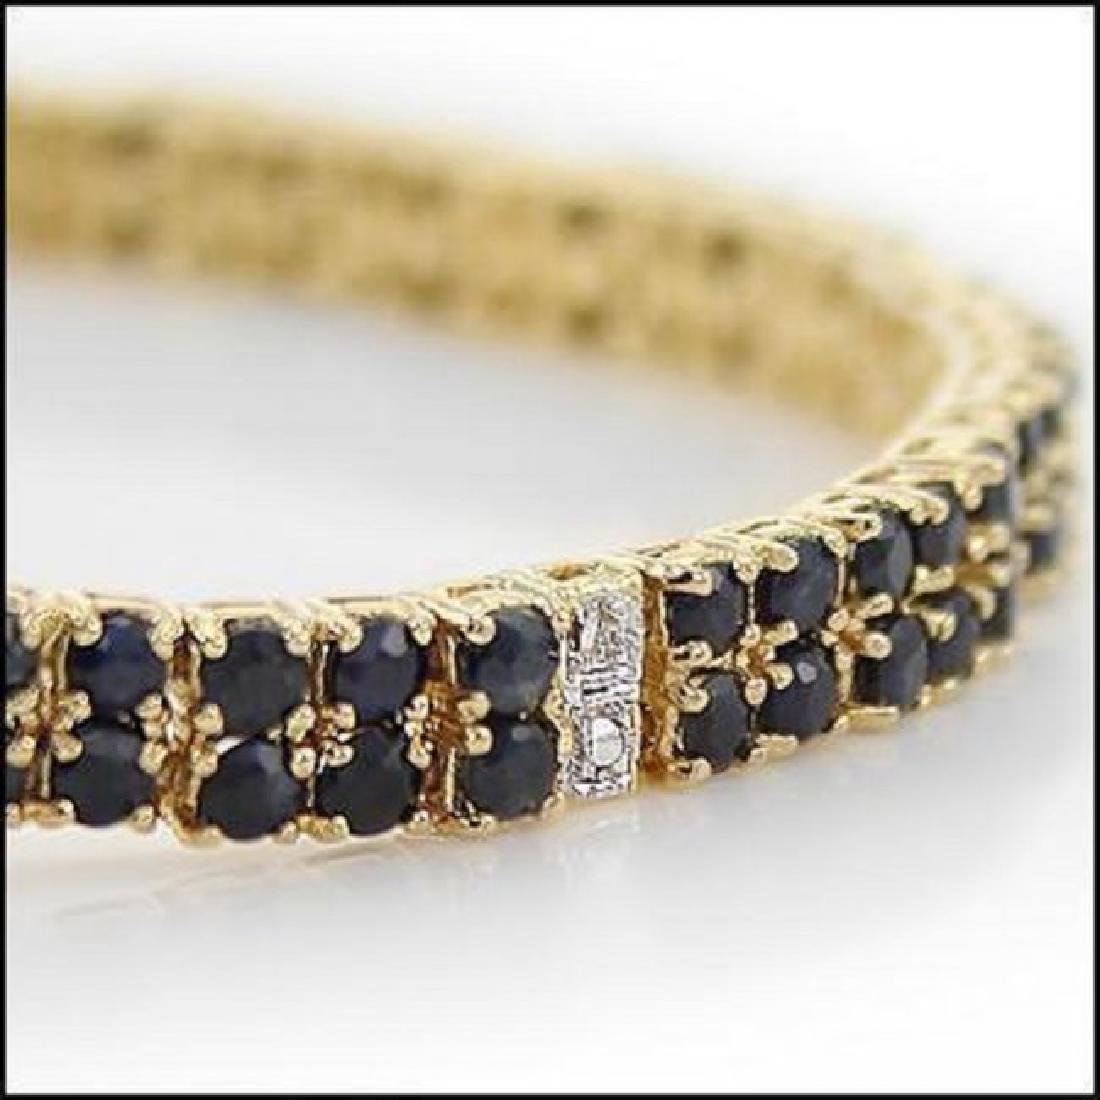 Jewelry Sale 17.69 CT Sapphire & Diamond Bracelet - 2